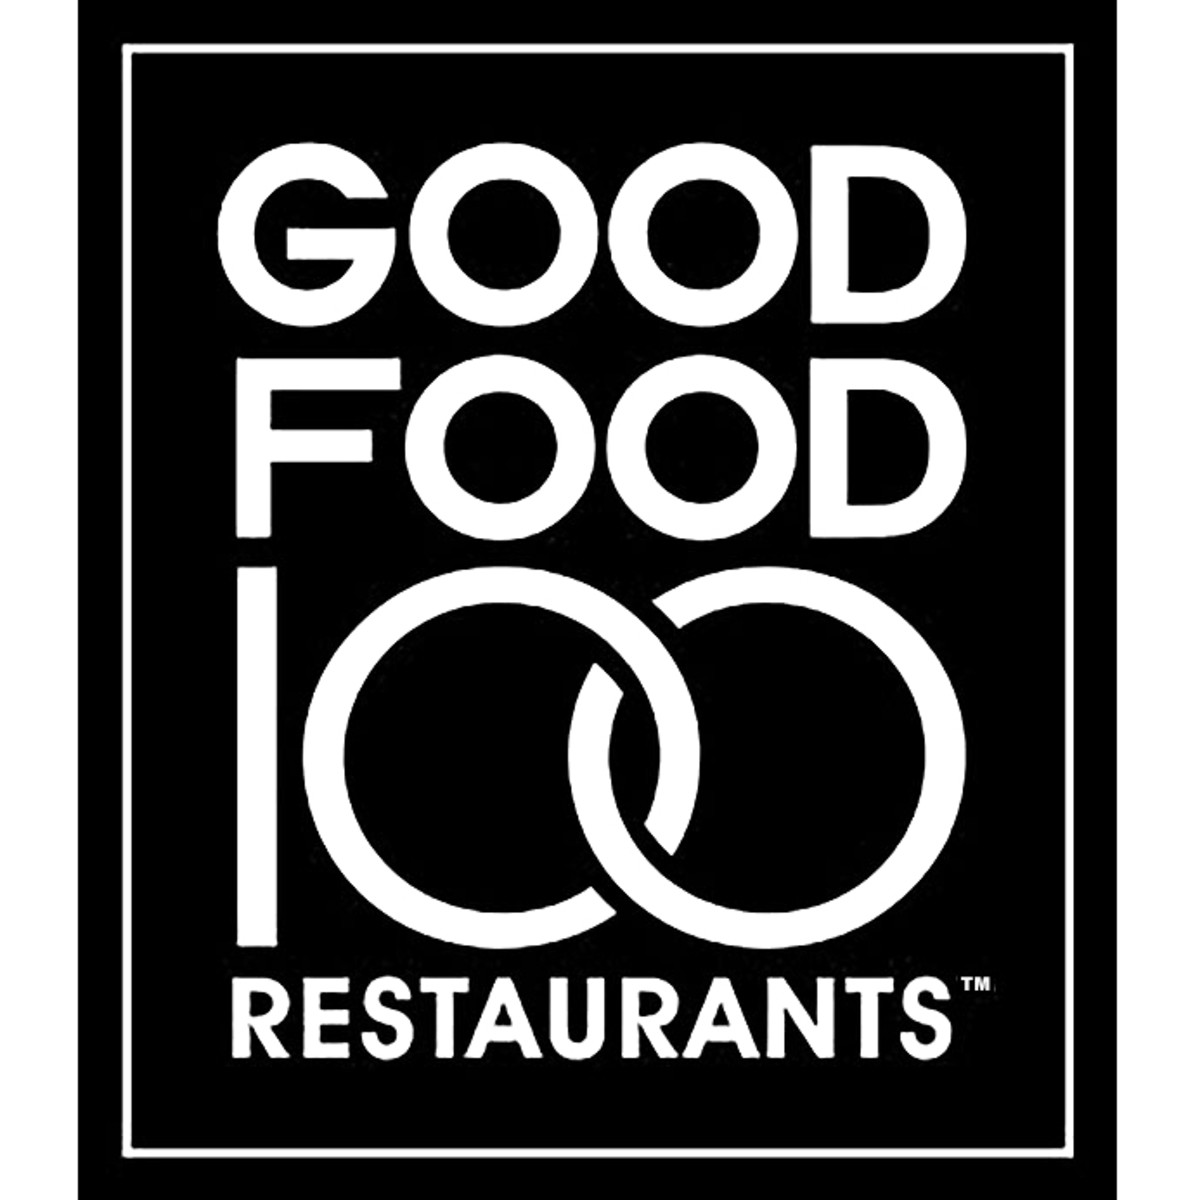 good-food-100-restaurants-0917-103088713.jpg